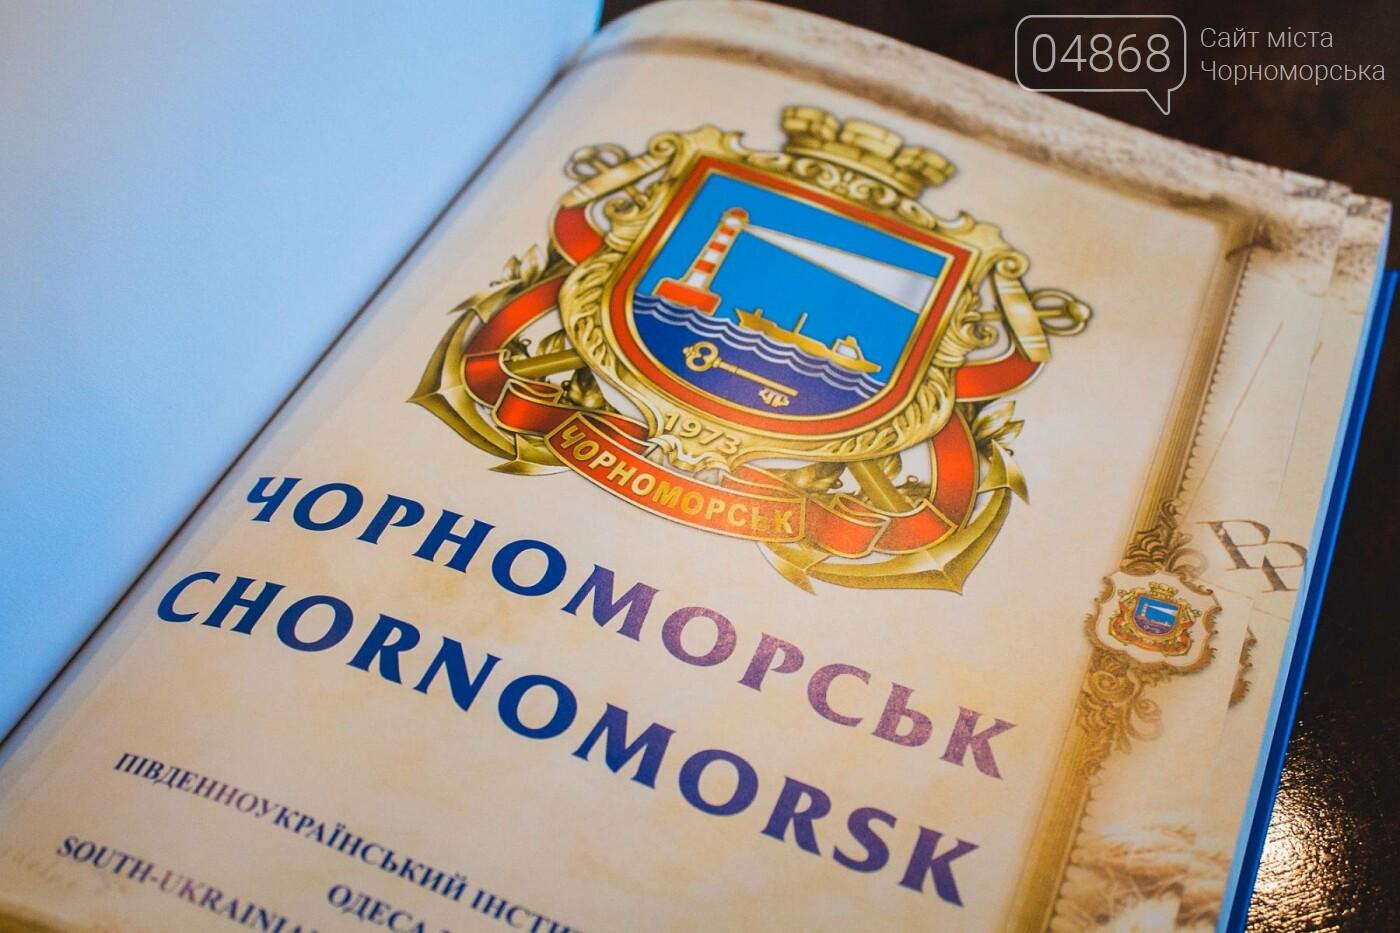 Состоялась презентация книги о Черноморске, фото-4